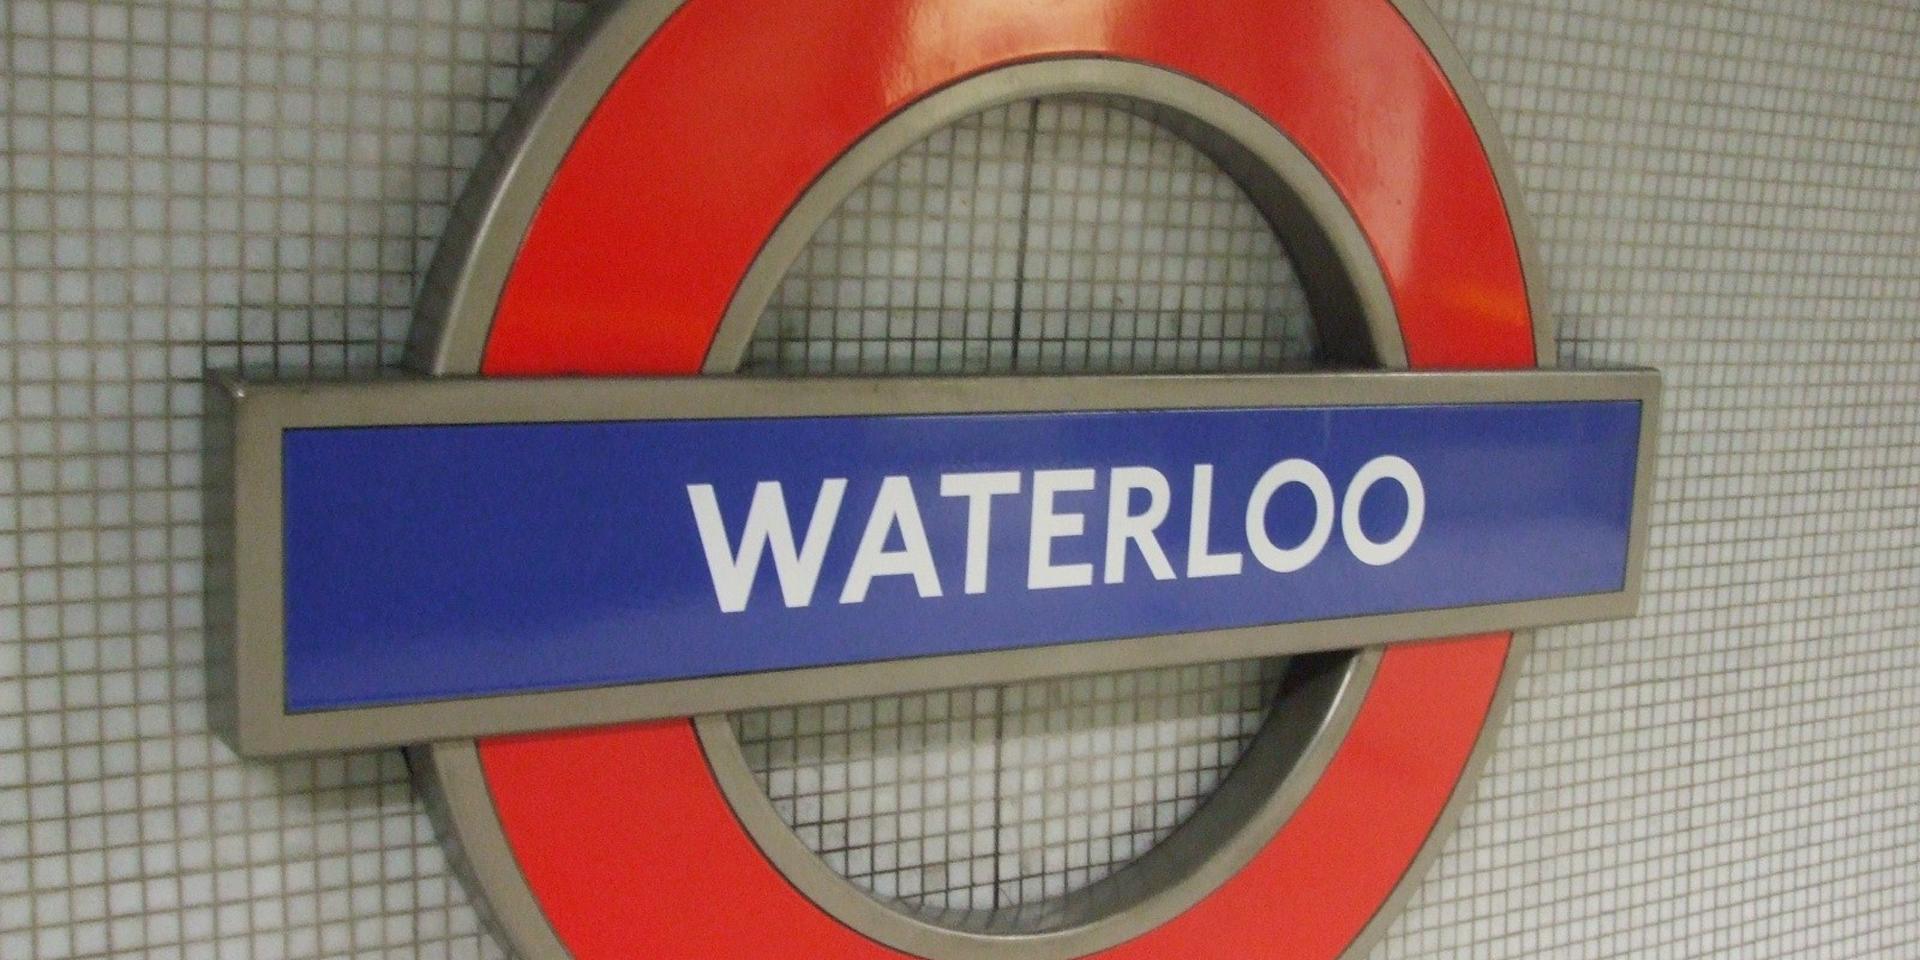 Waterloo underground station, London